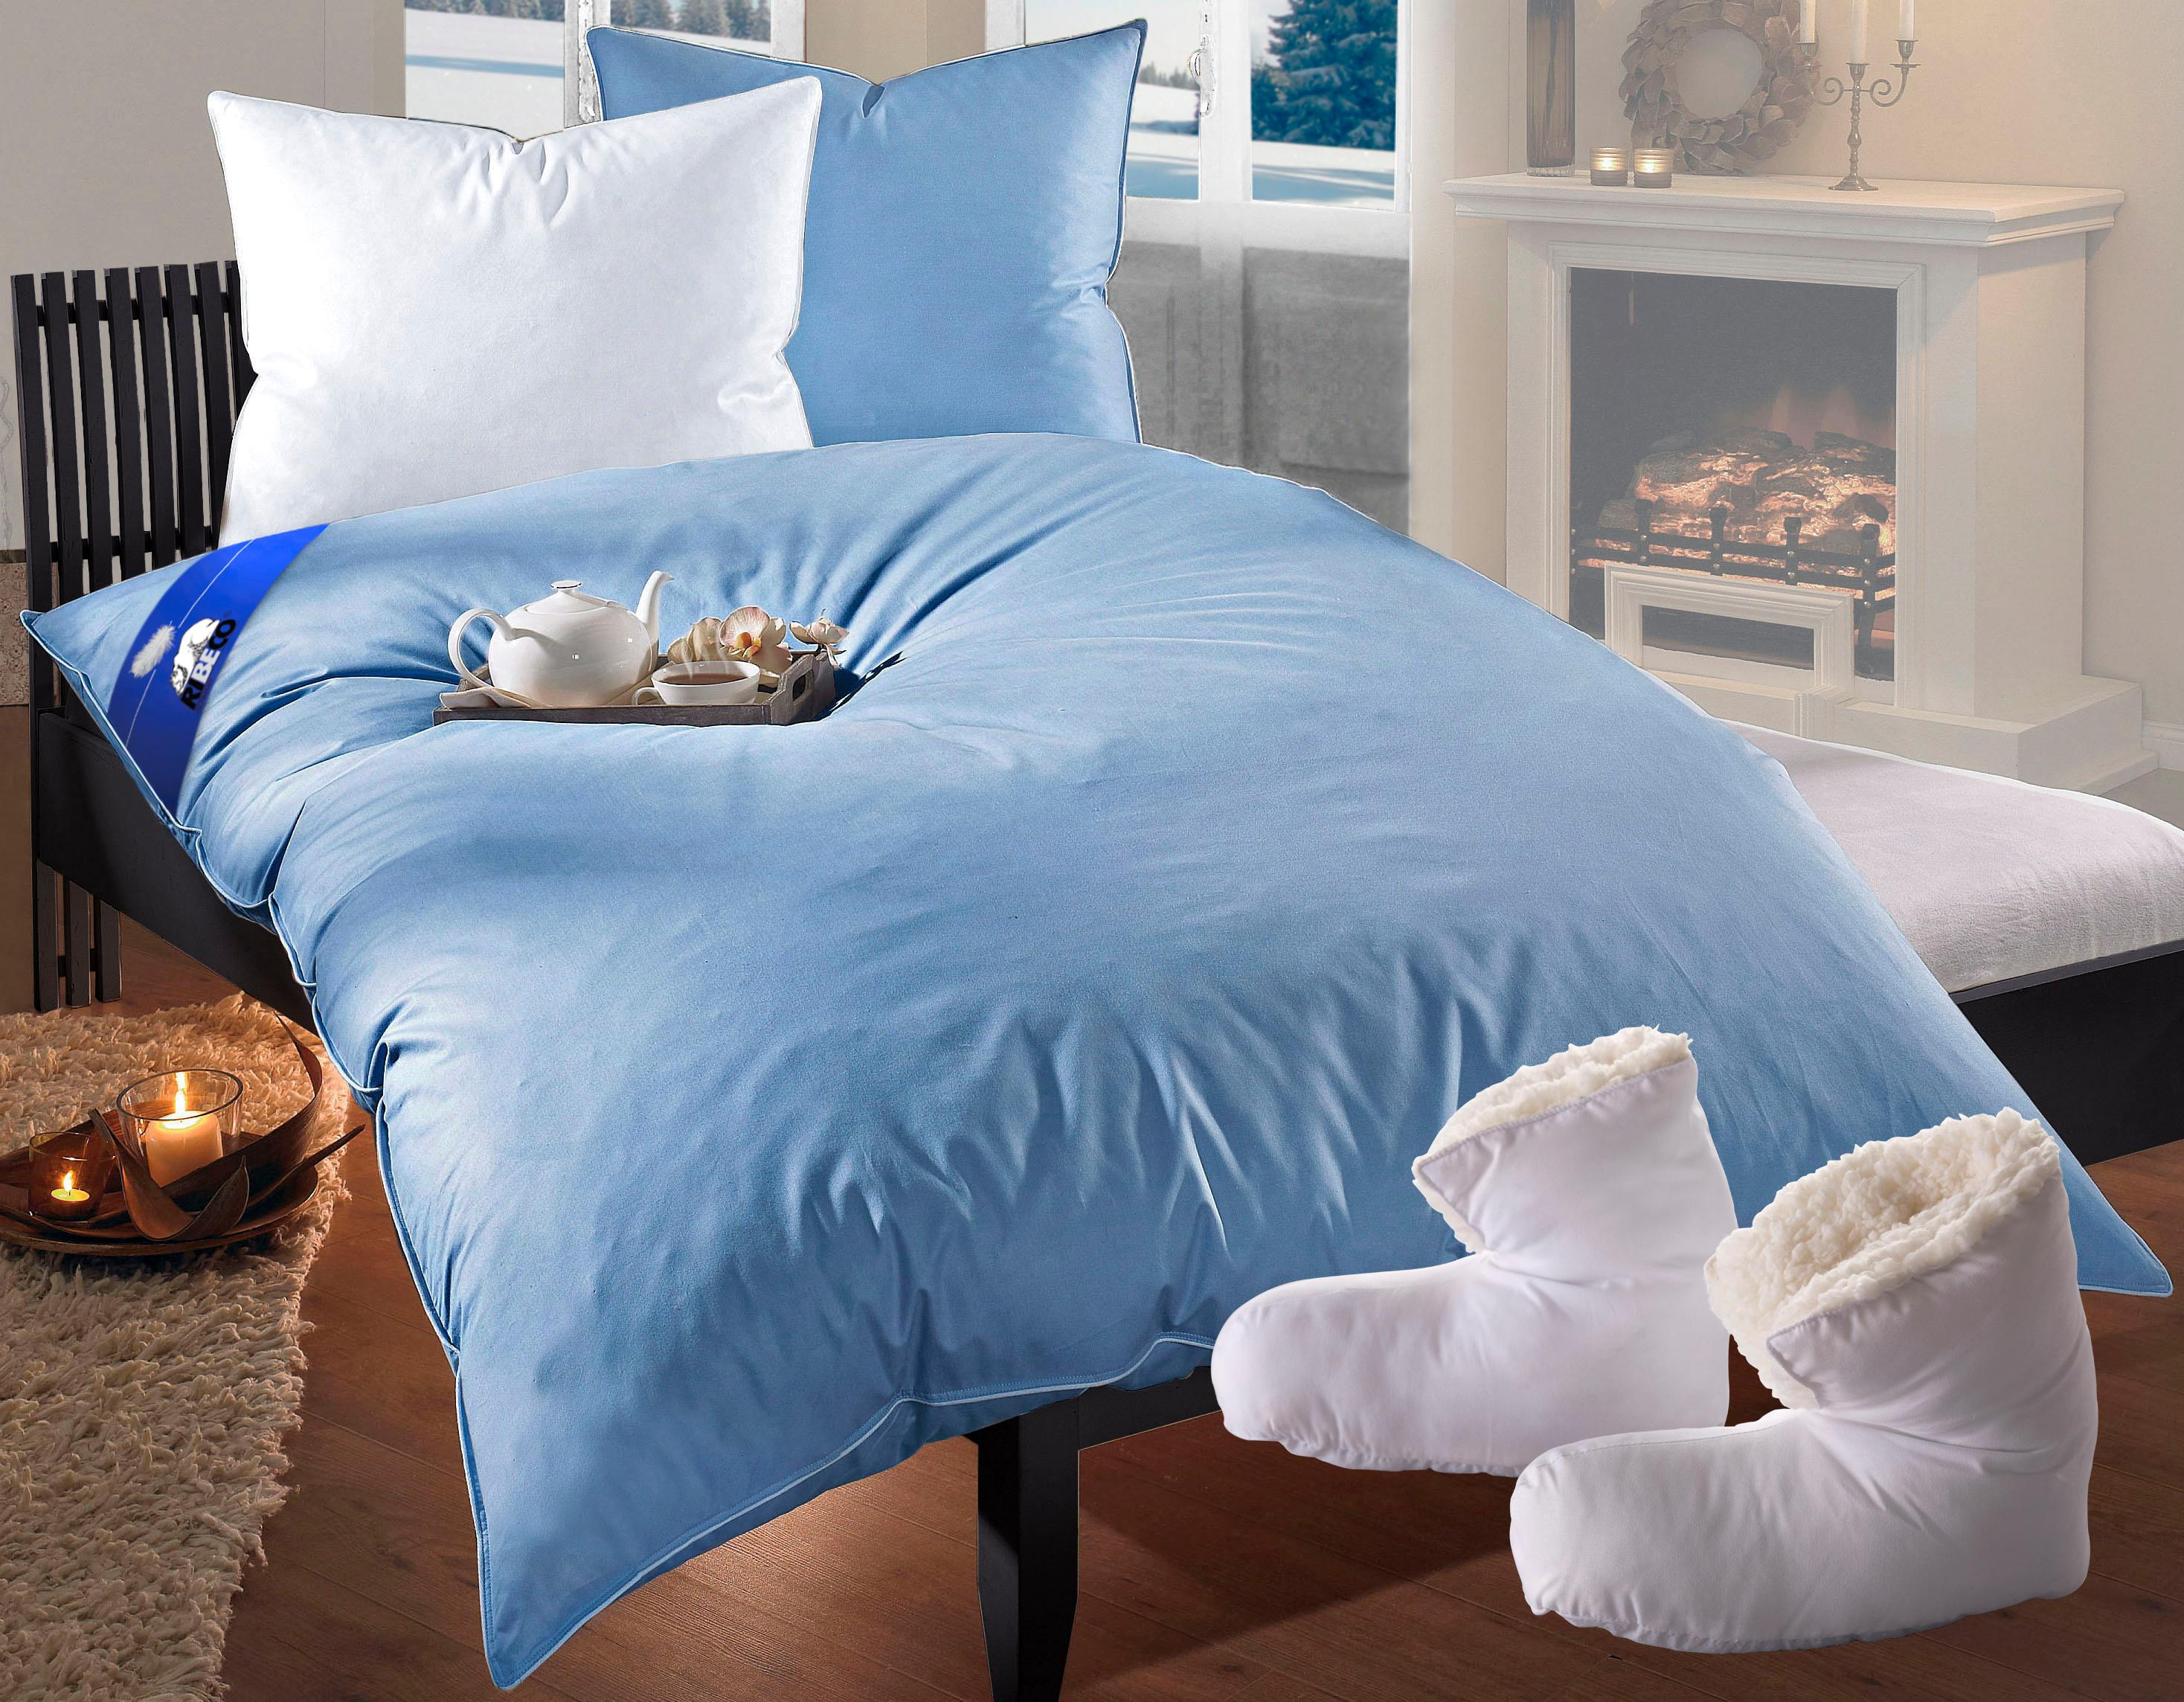 Federbettdecke, »Liam«, RIBECO, extrawarm, Füllung: 85% Federn, 15% Daunen, (2-tlg.) | Heimtextilien > Decken und Kissen > Bettdecken | Federn | RIBECO